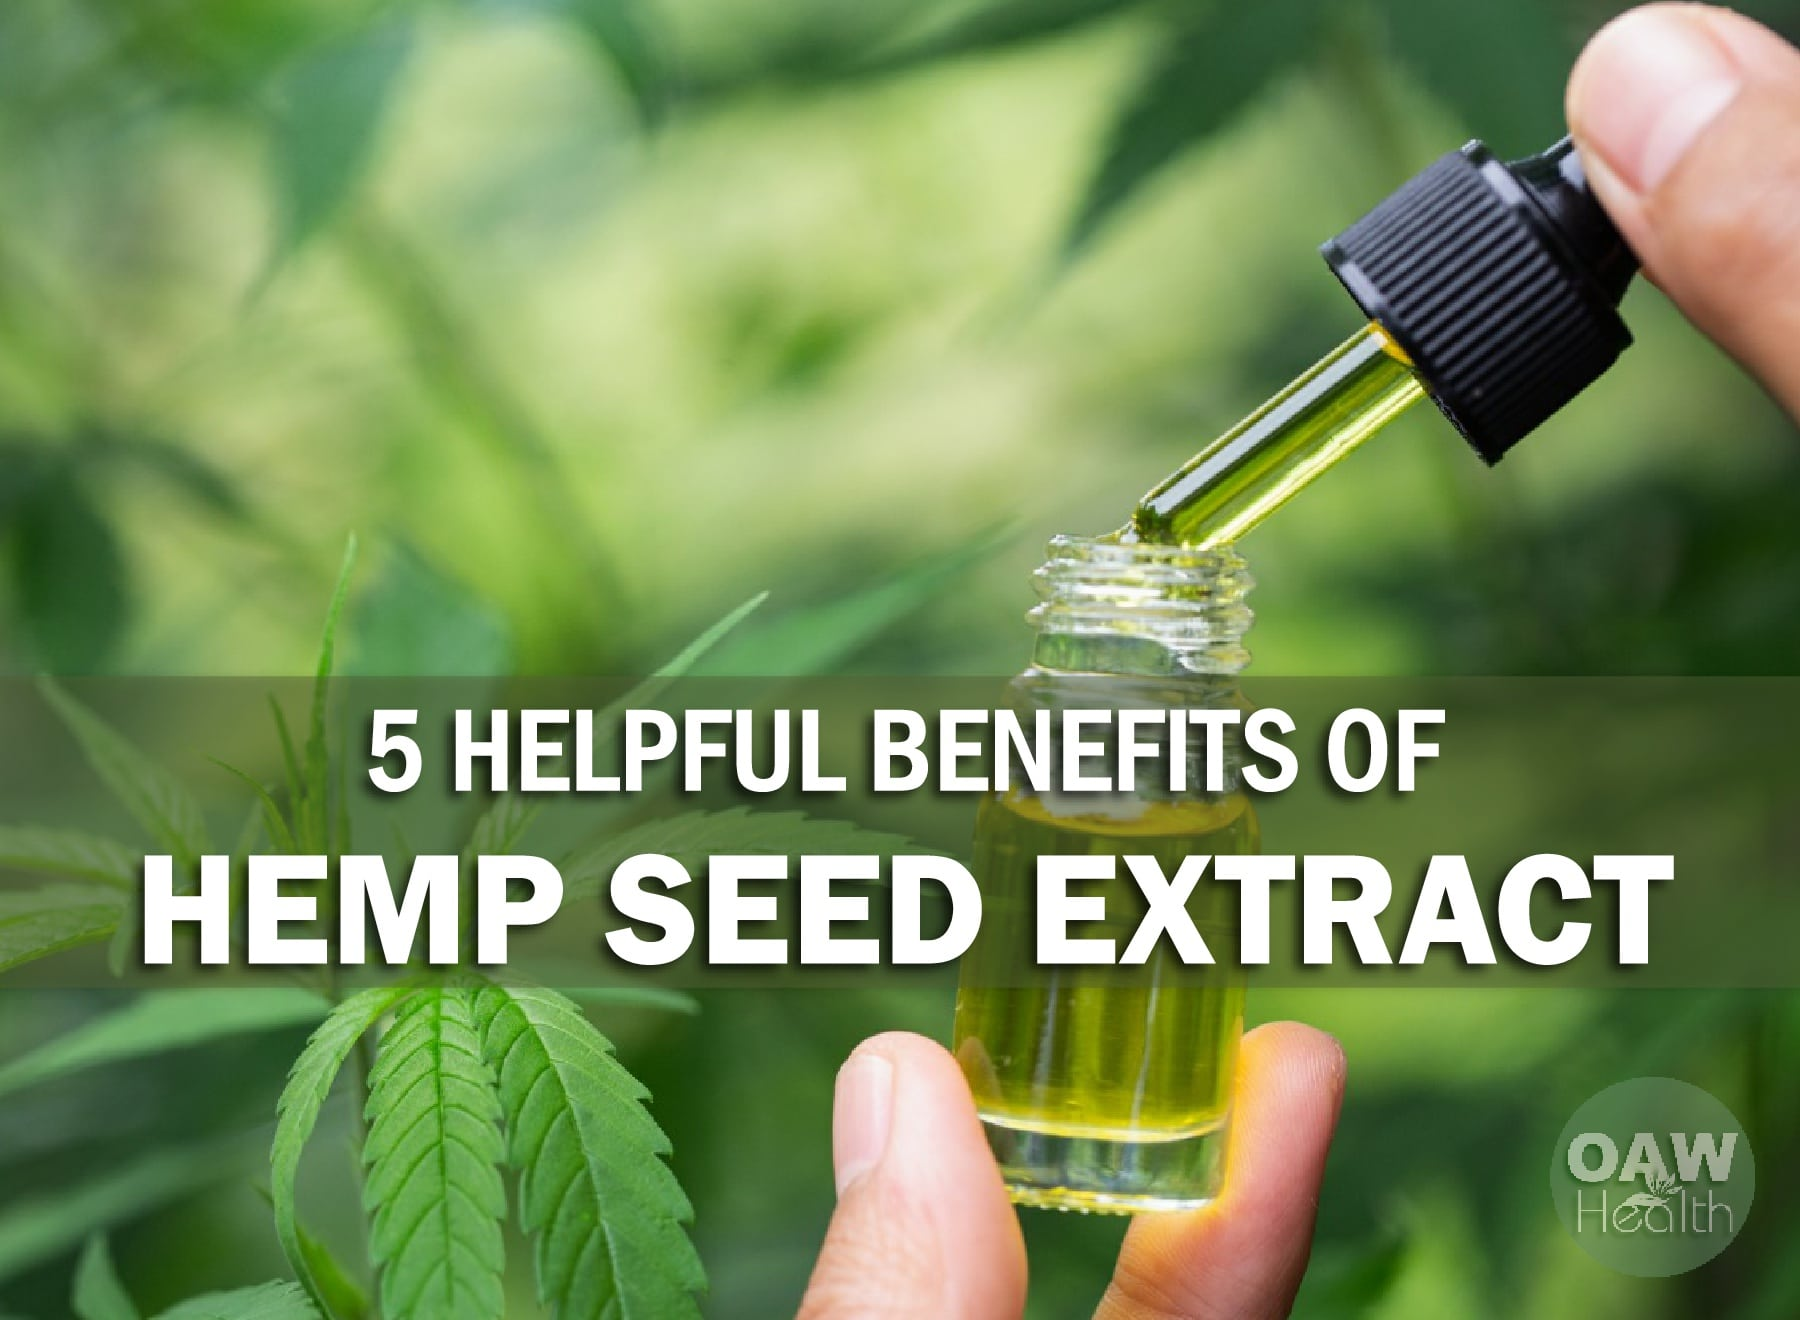 5 Helpful Benefits of Hemp Extract